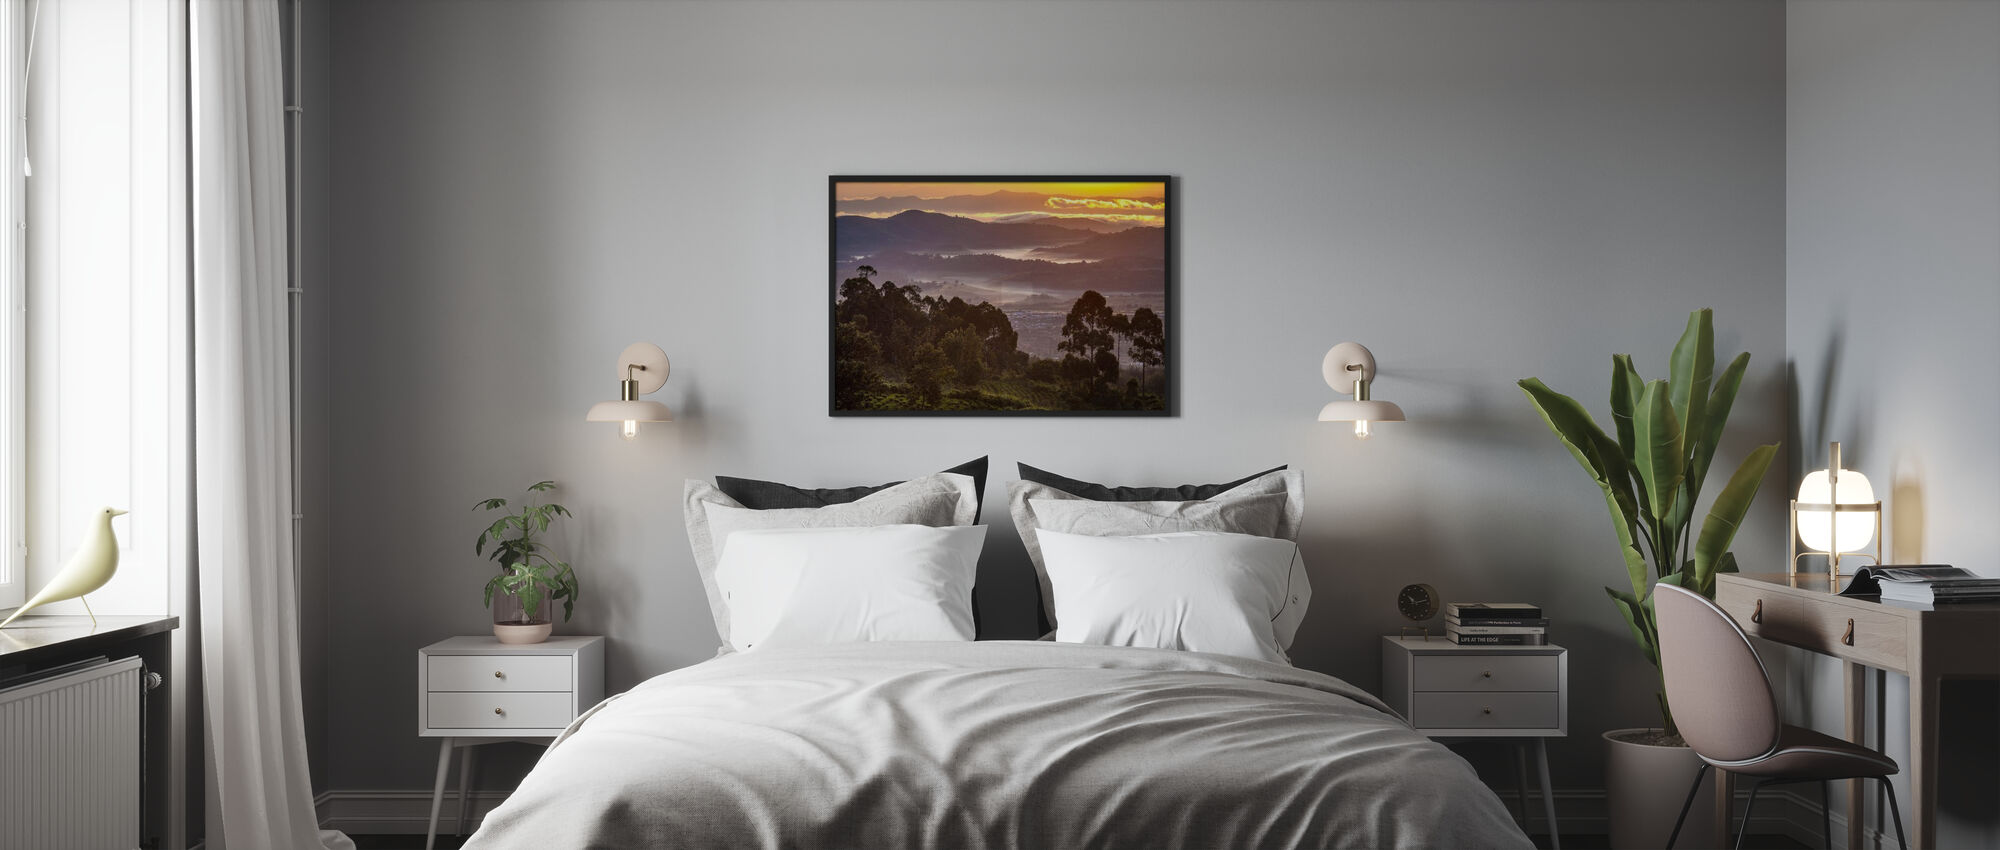 Lake Kivu - Poster - Bedroom